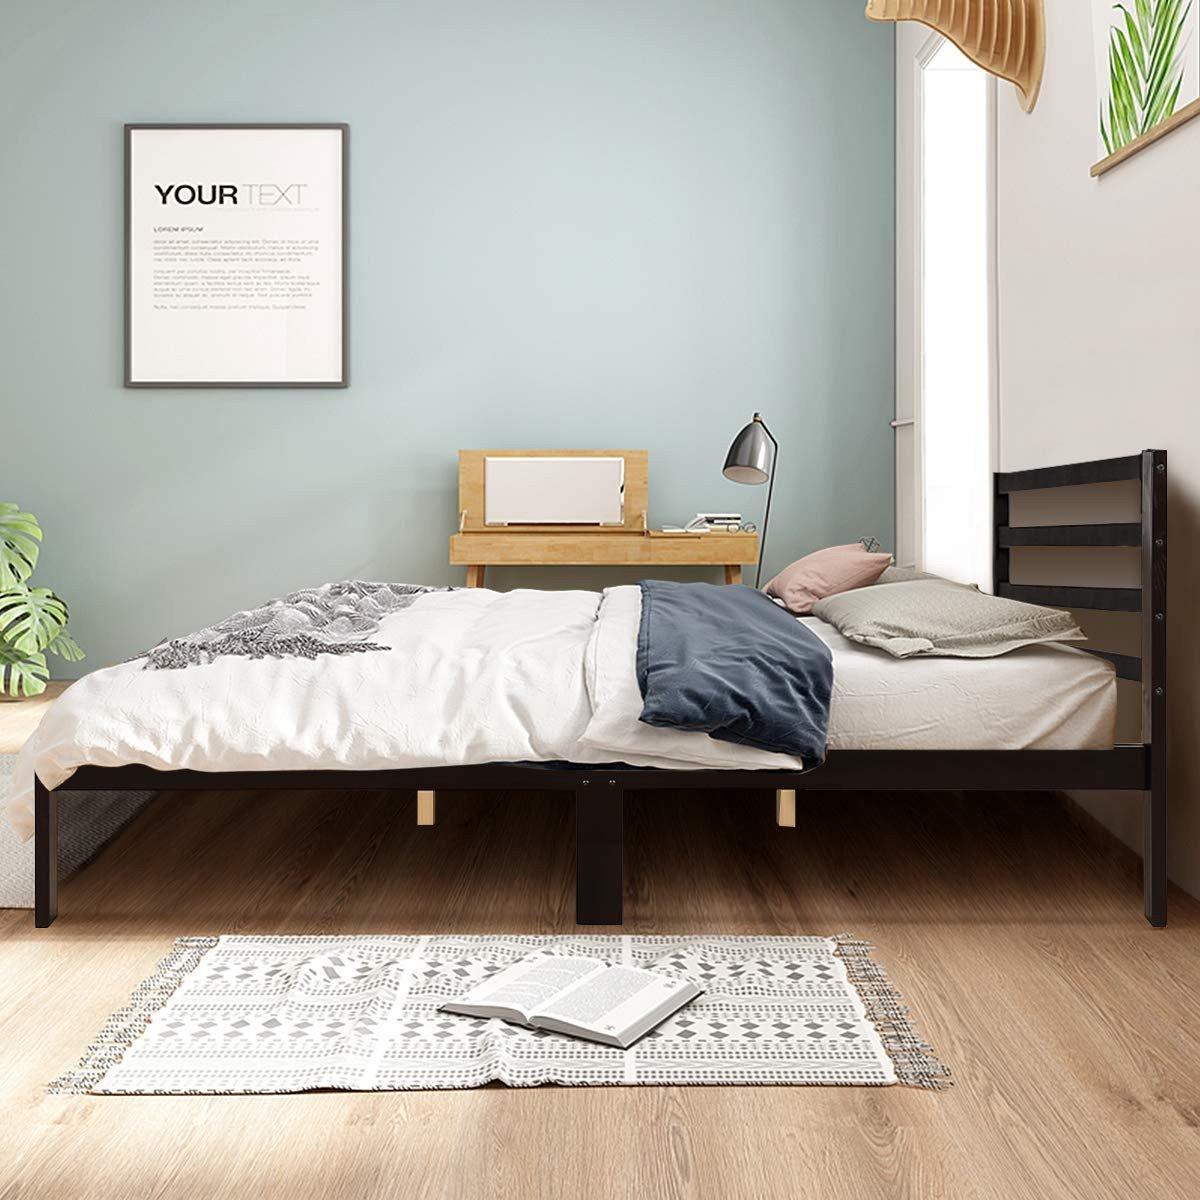 Sears Furniture Bedroom Set Best Of Giantex Modern Wood Platform Bed Frame W Headboard Mattress Foundation Queen 8 Bar Slat Better Support Box Spring Optional Multipurpose Bed Base